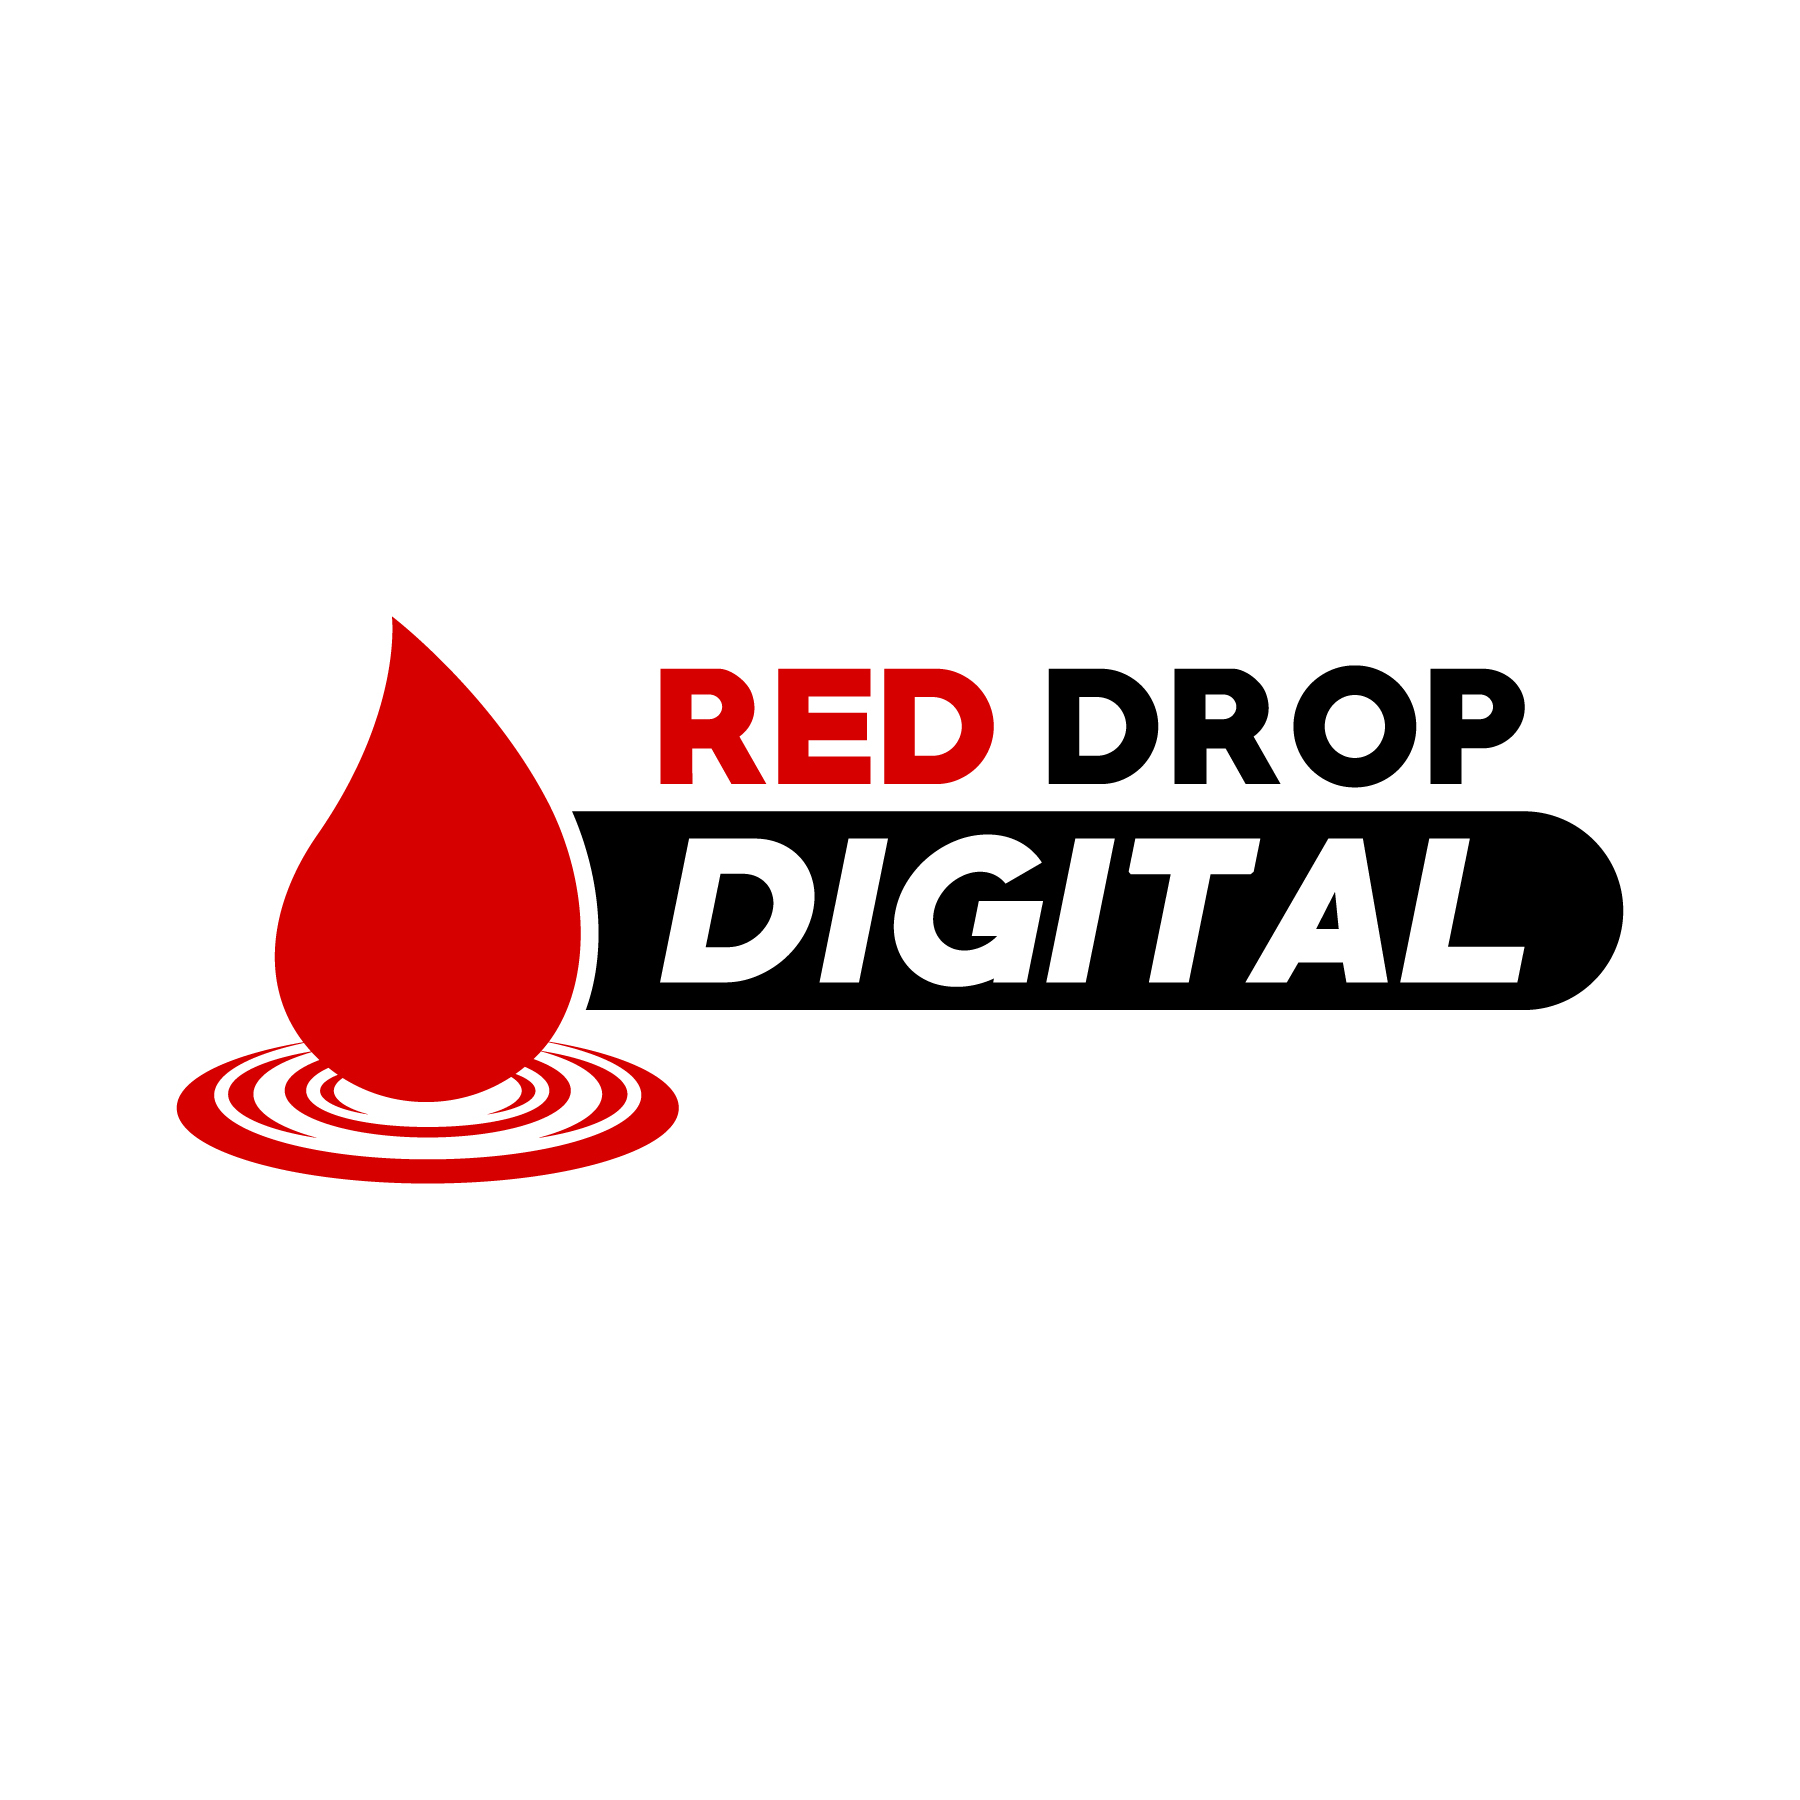 Red Drop Digital